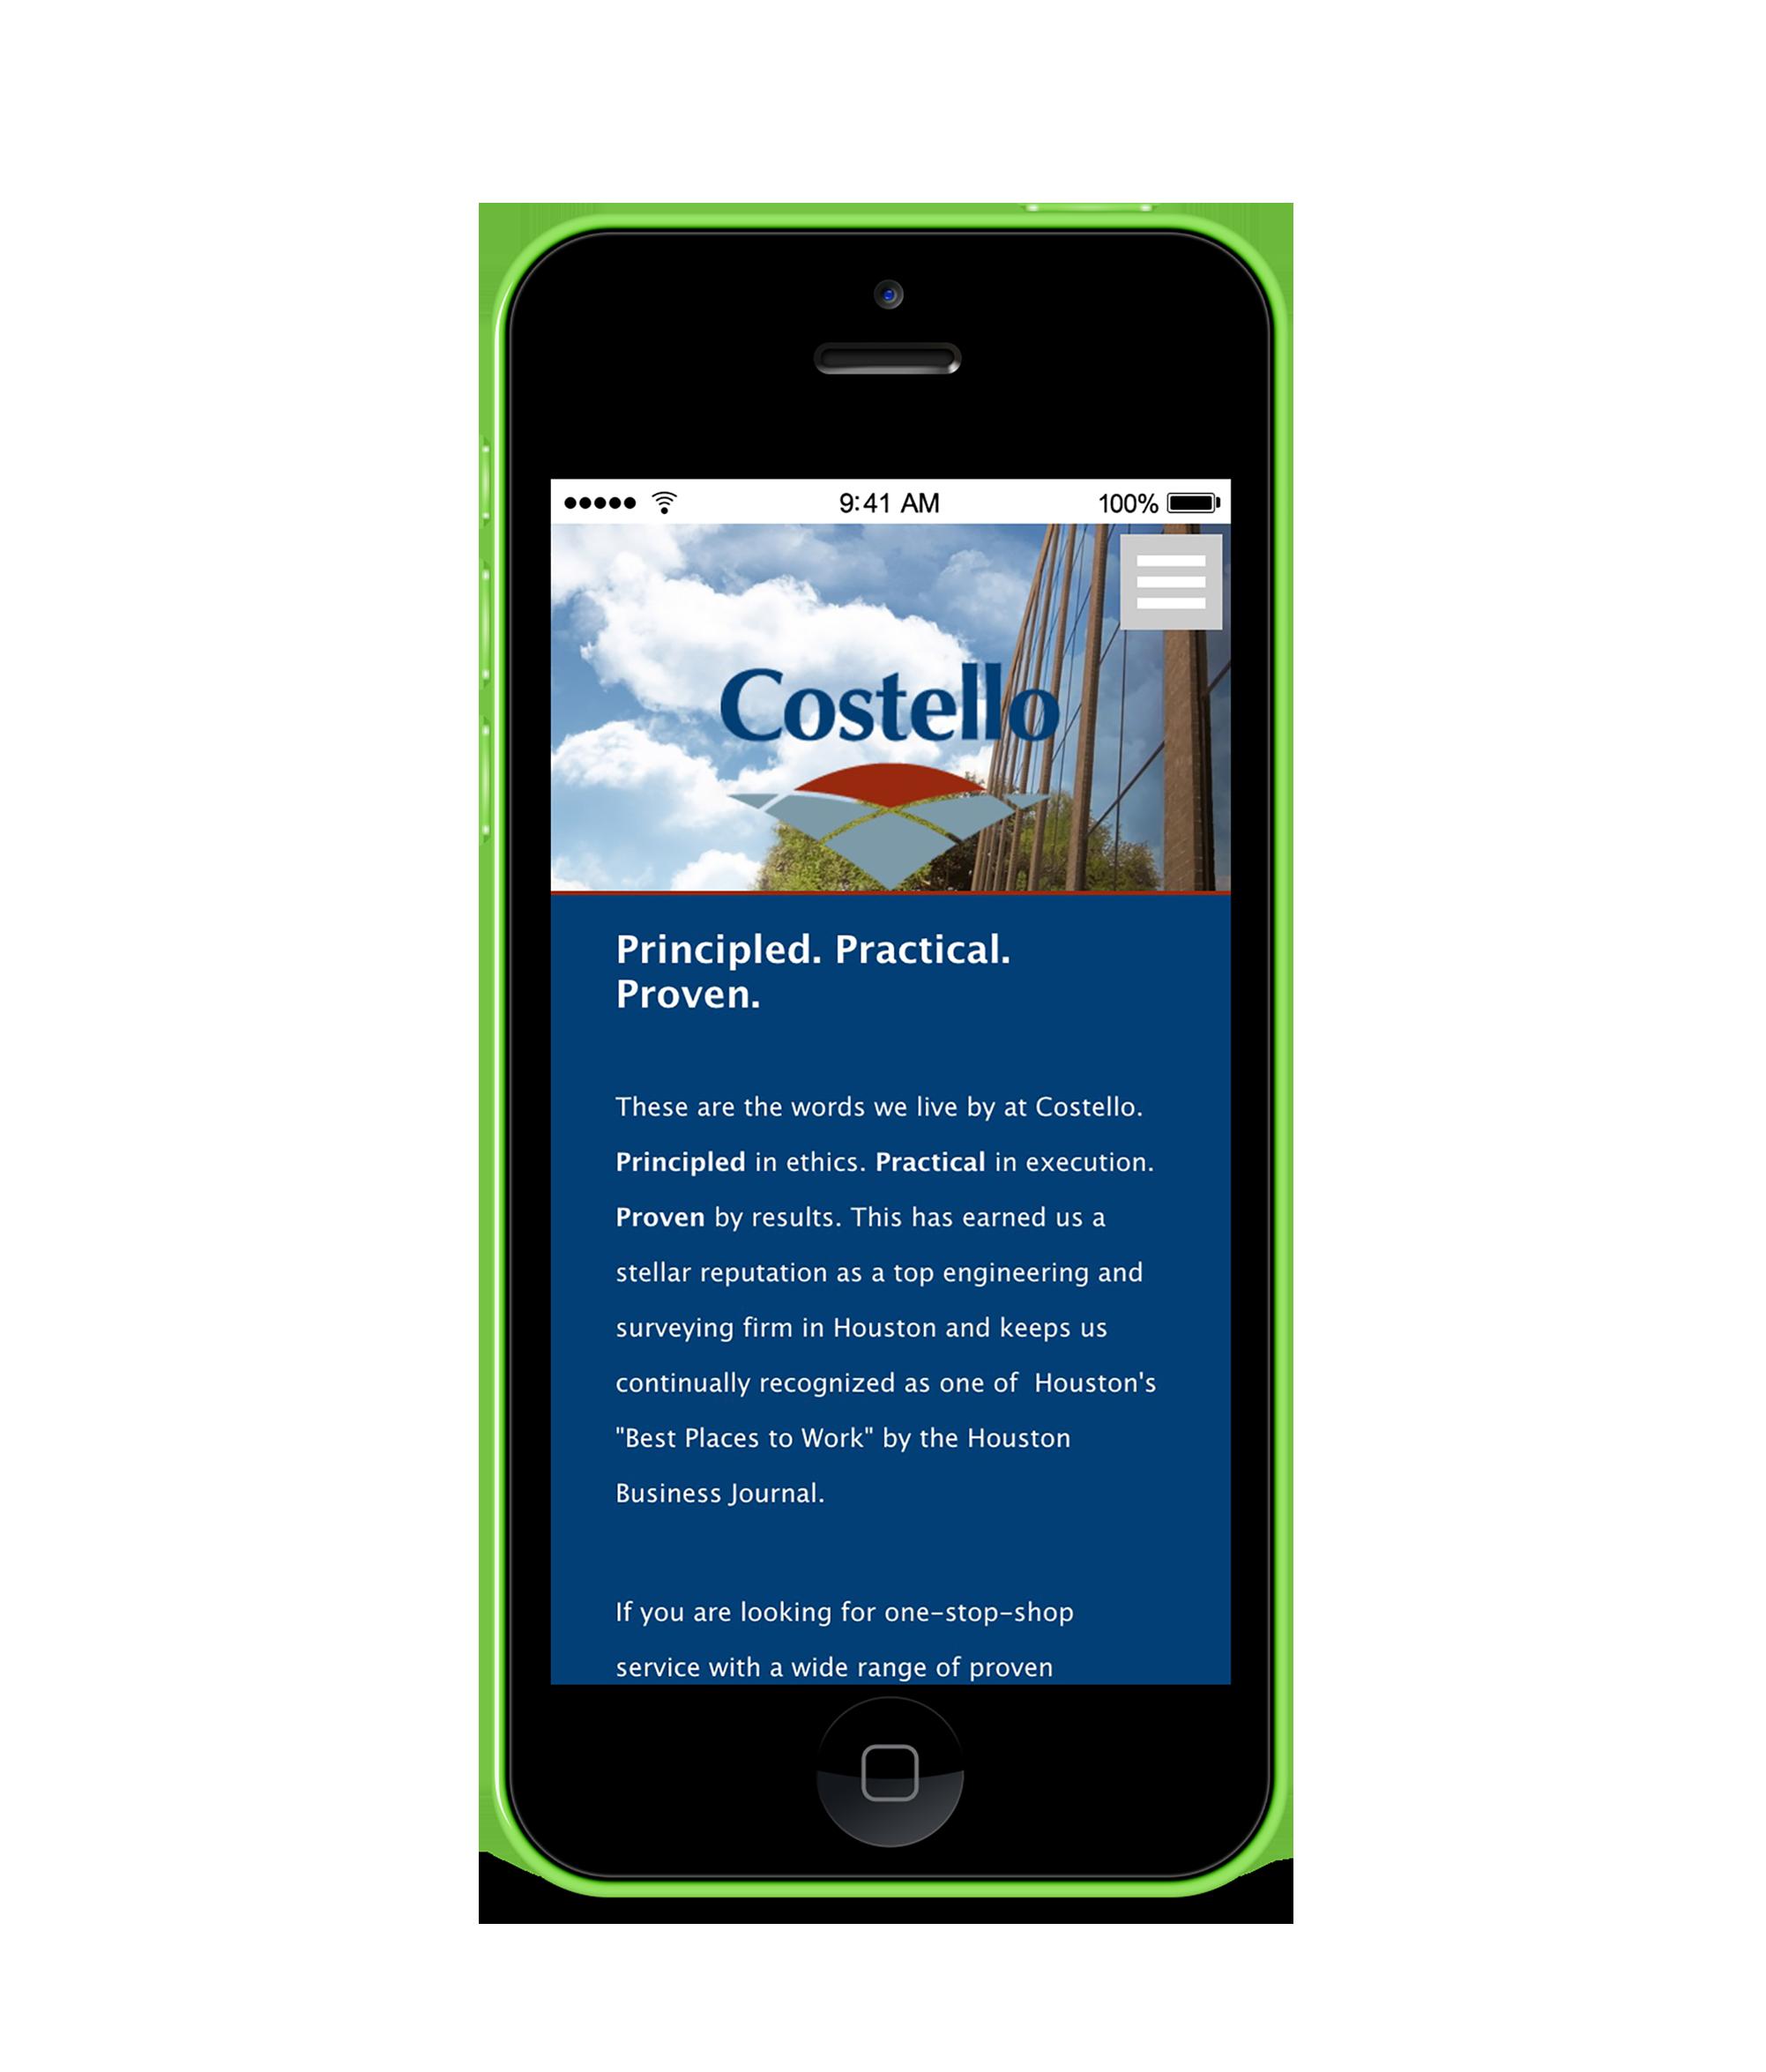 Costello-iphone